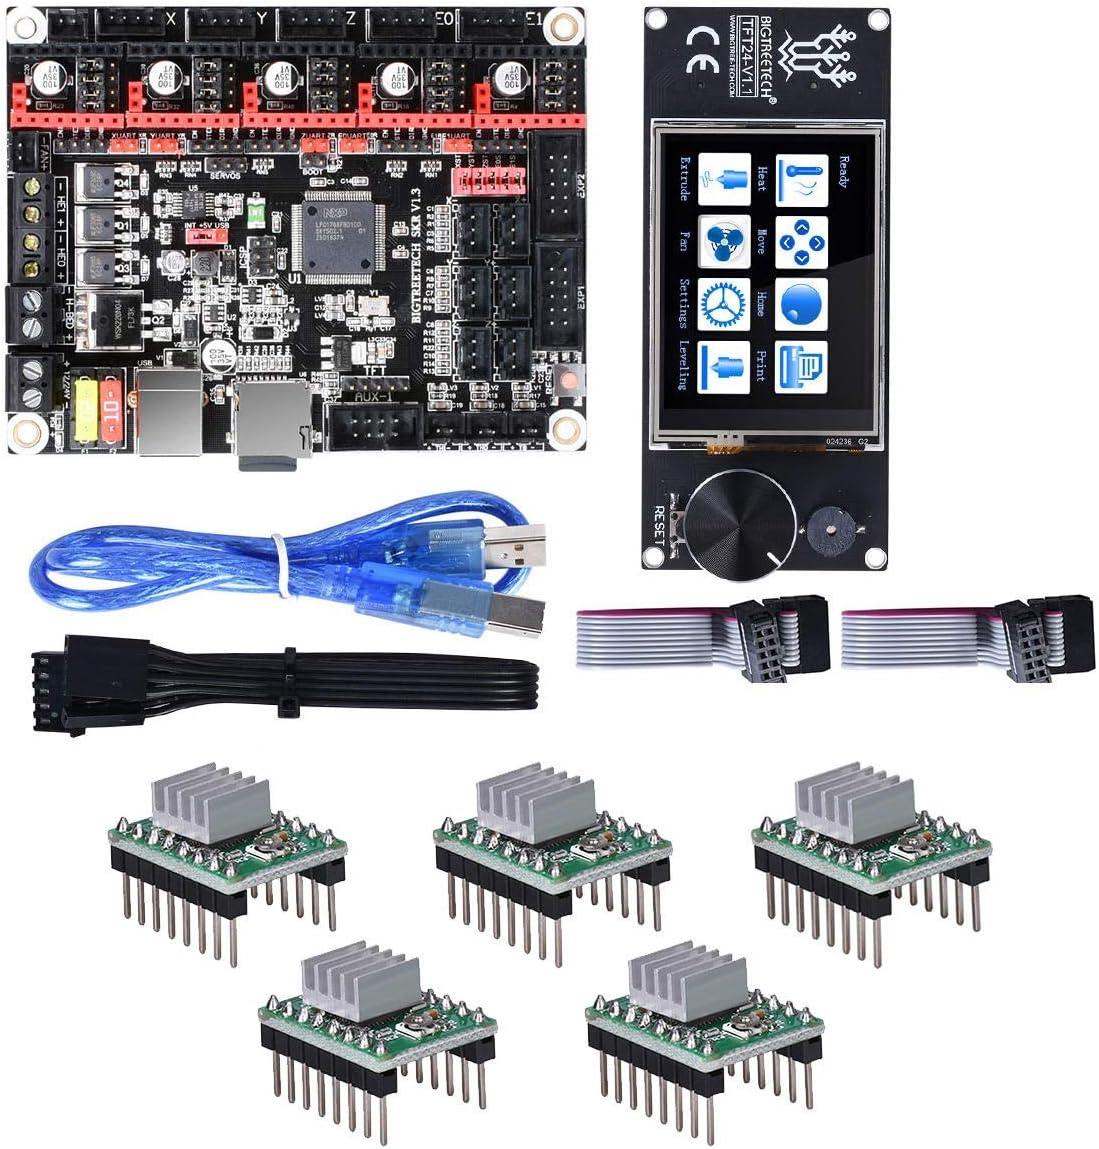 3Dプリンター部品のBIGTREETECH SKR 32ビットコントローラボードV1.3 + TFT24のタッチスクリーン+の5pcs A4988ステッピングドライバキット YHWJP